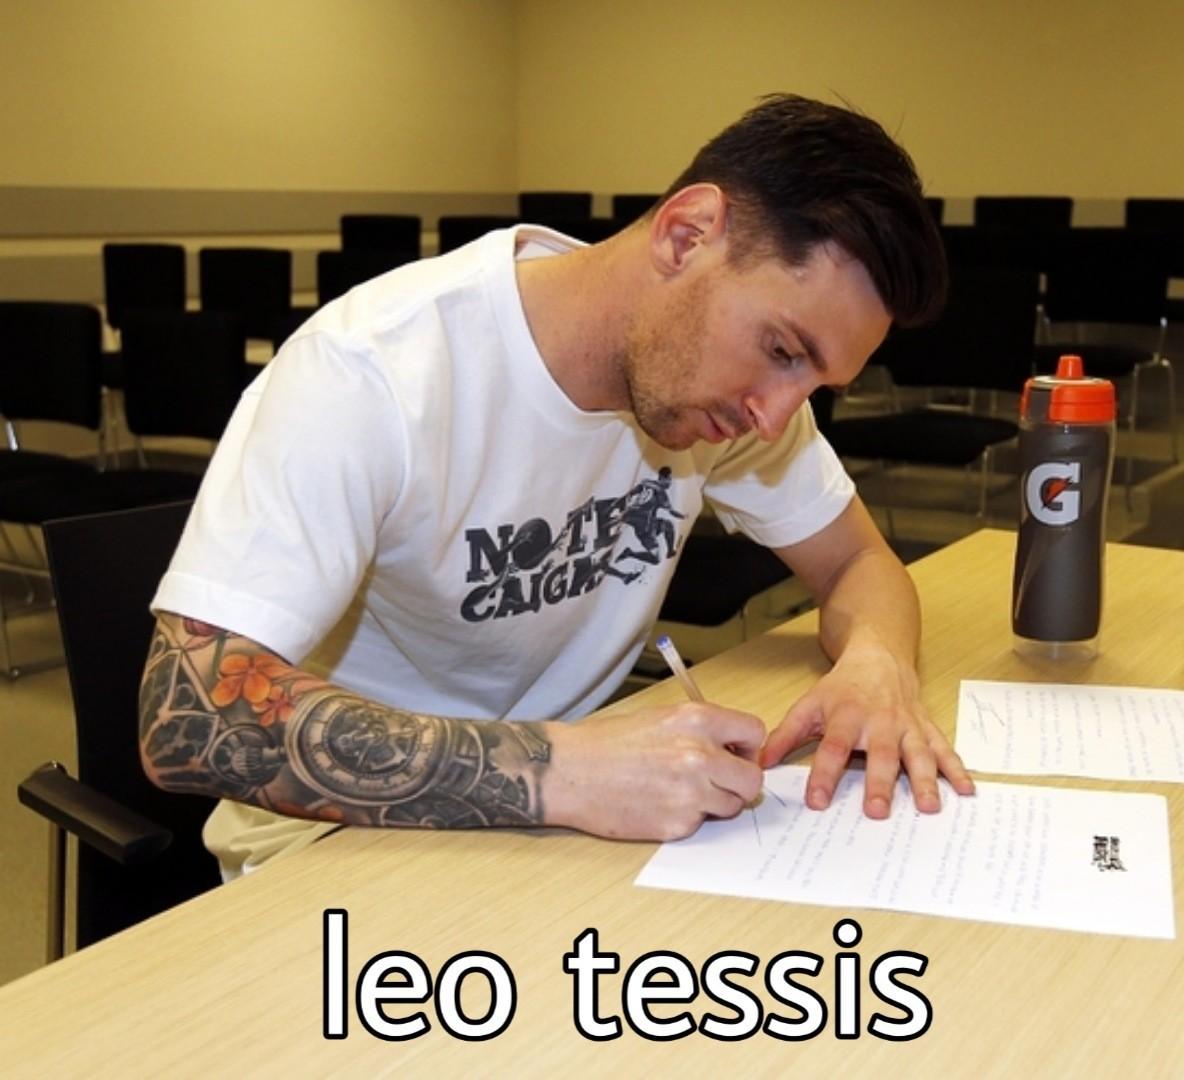 Leo tessis - meme